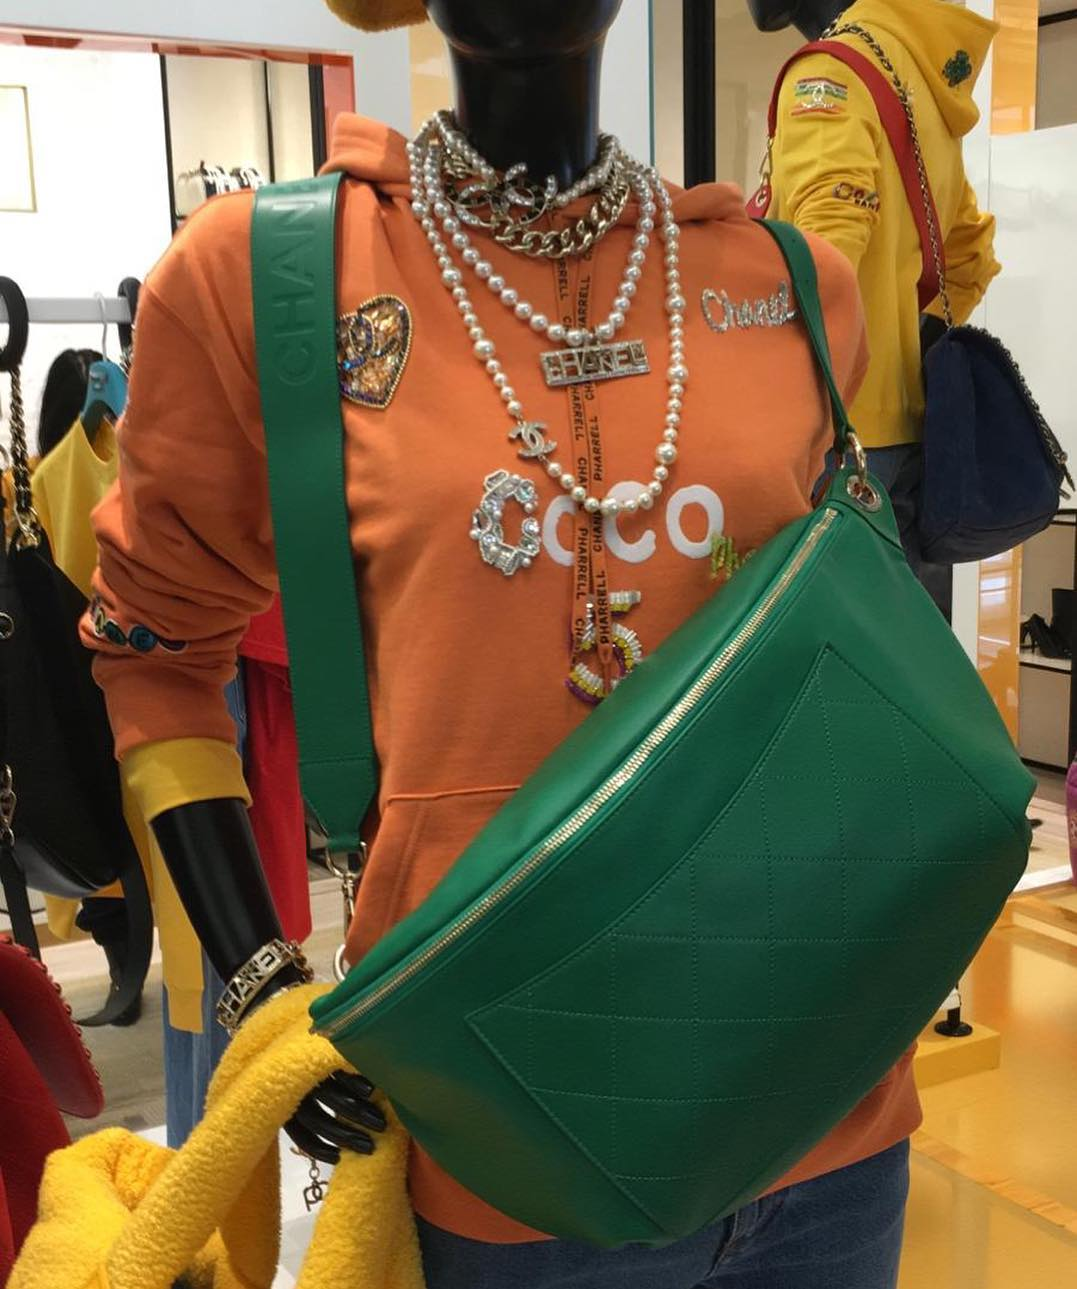 Chanel Pharrel buyflyboutique